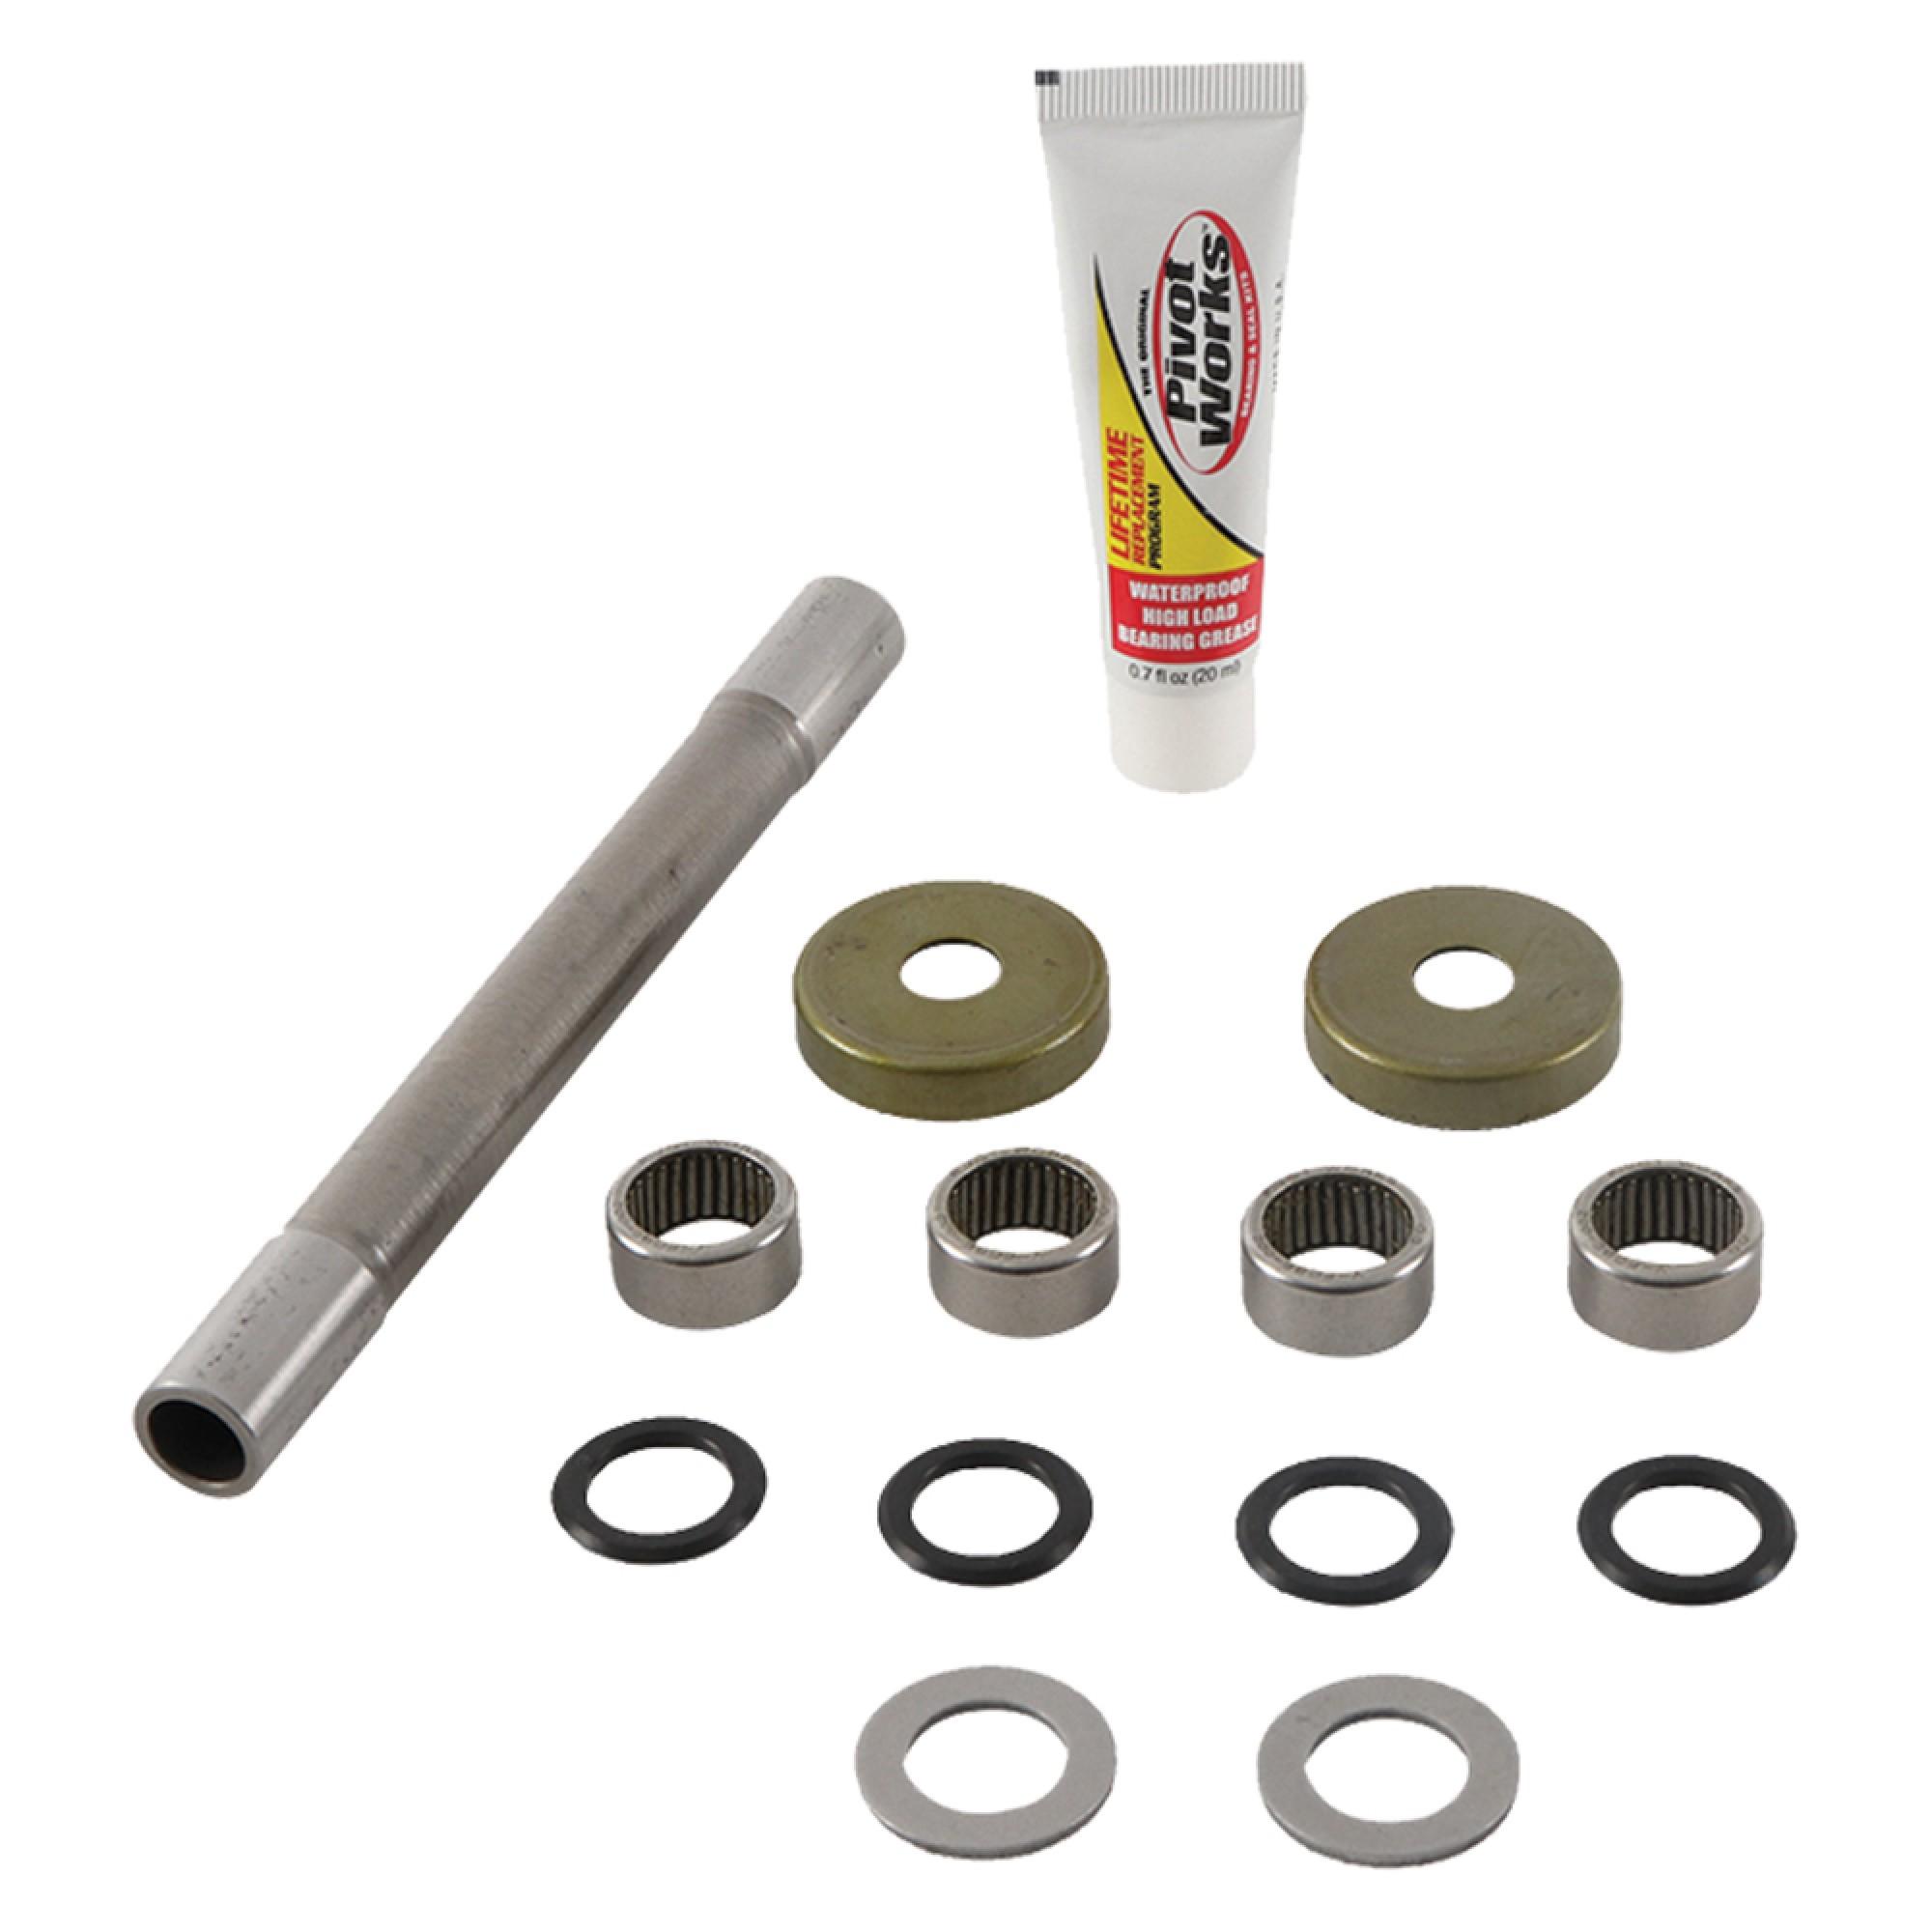 1985-2003 Honda XR 100R Dirt Bike Pivot Works Swing Arm Bearing Kit